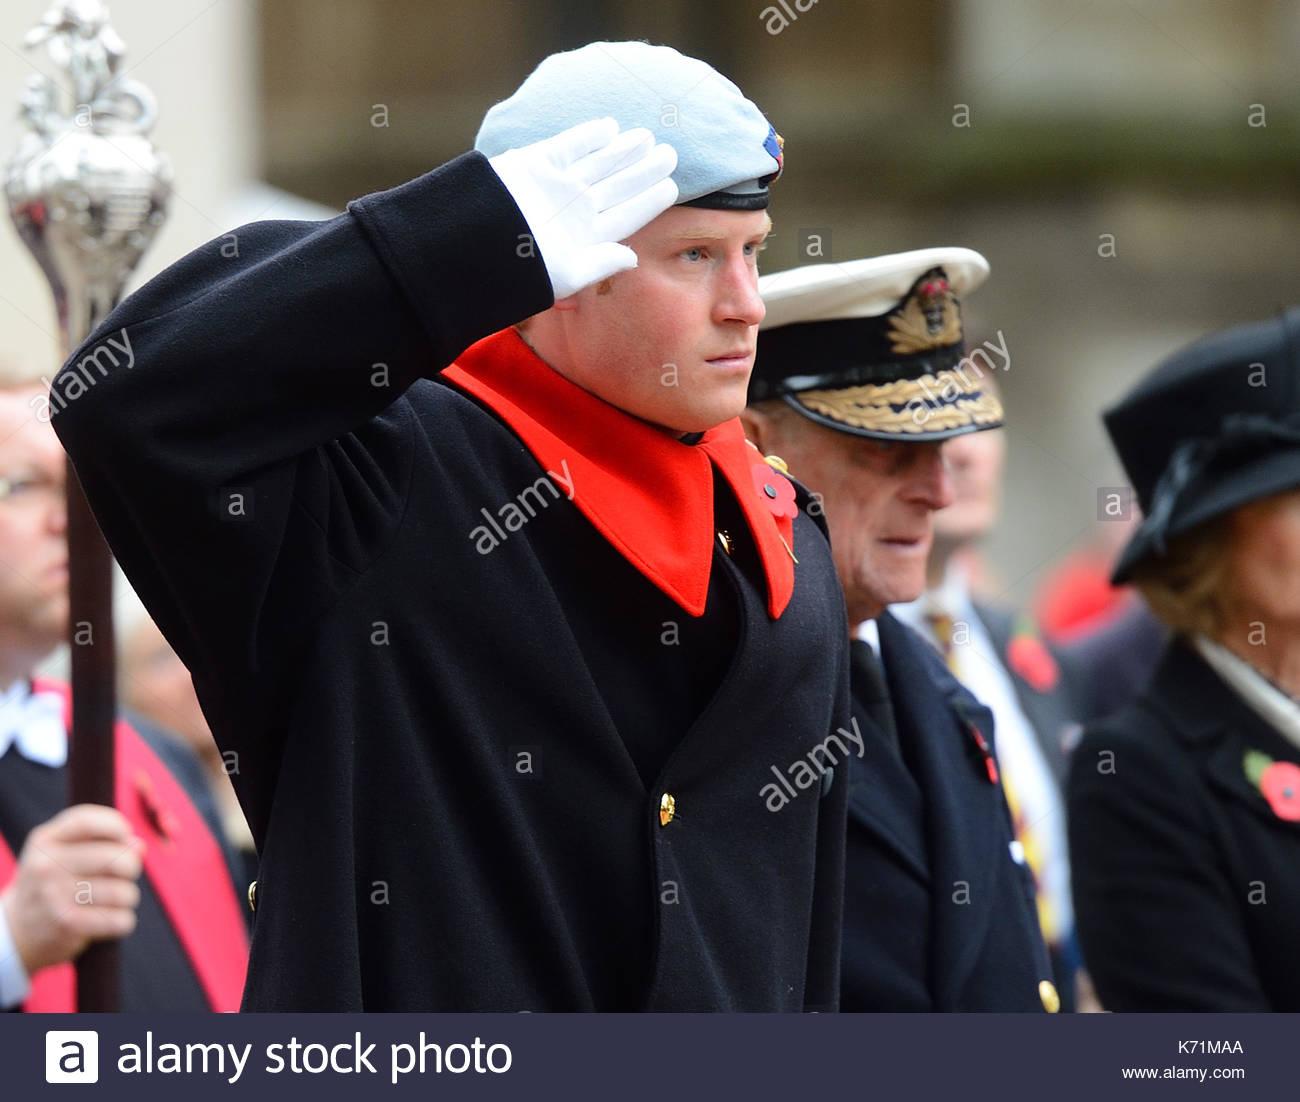 Prince Philip Uniform Stock Photos & Prince Philip Uniform